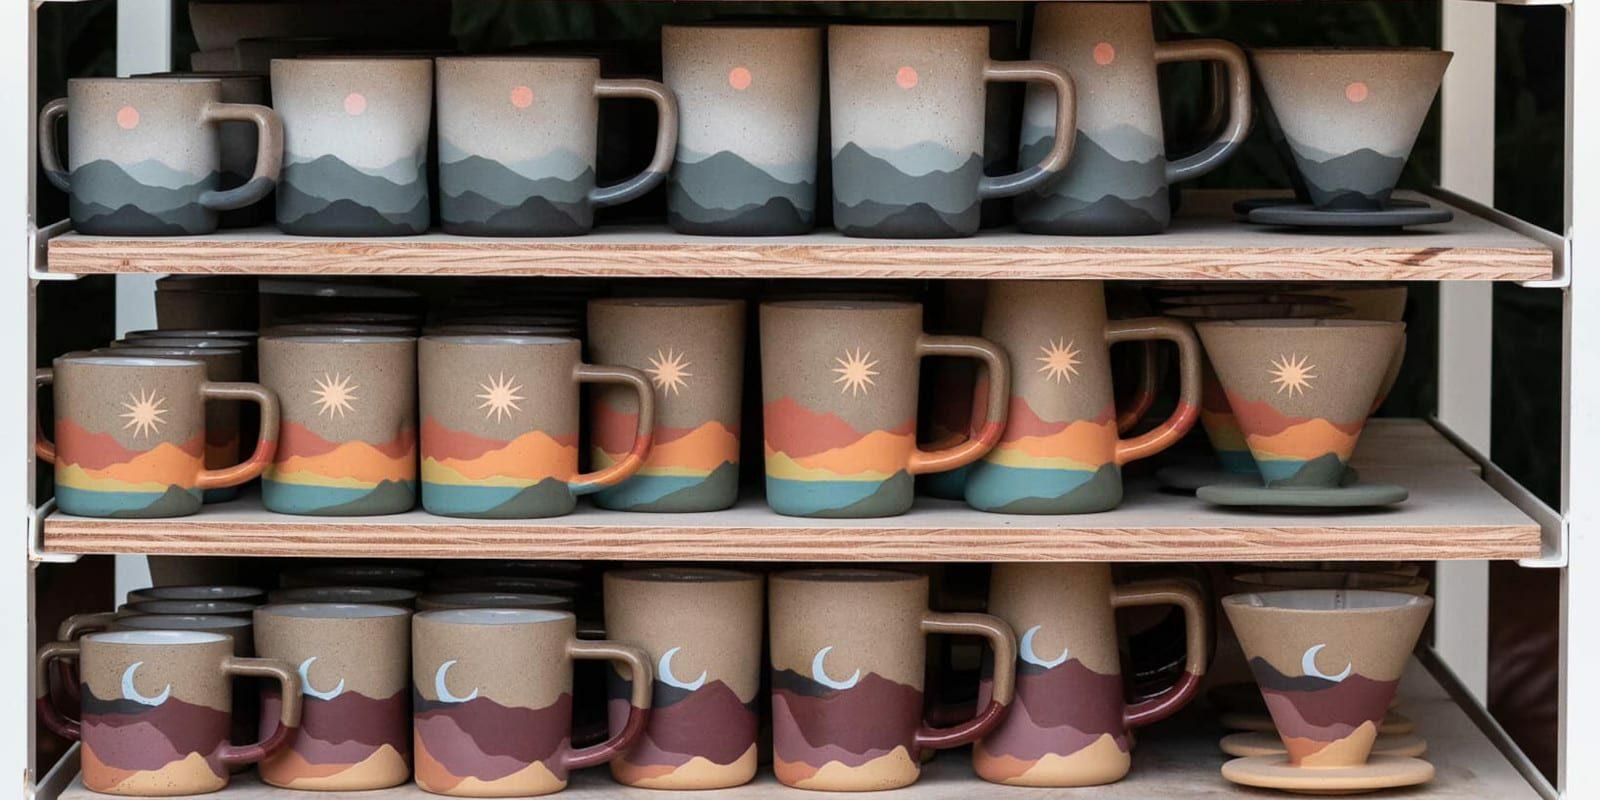 Image of racks of Callahan mugs